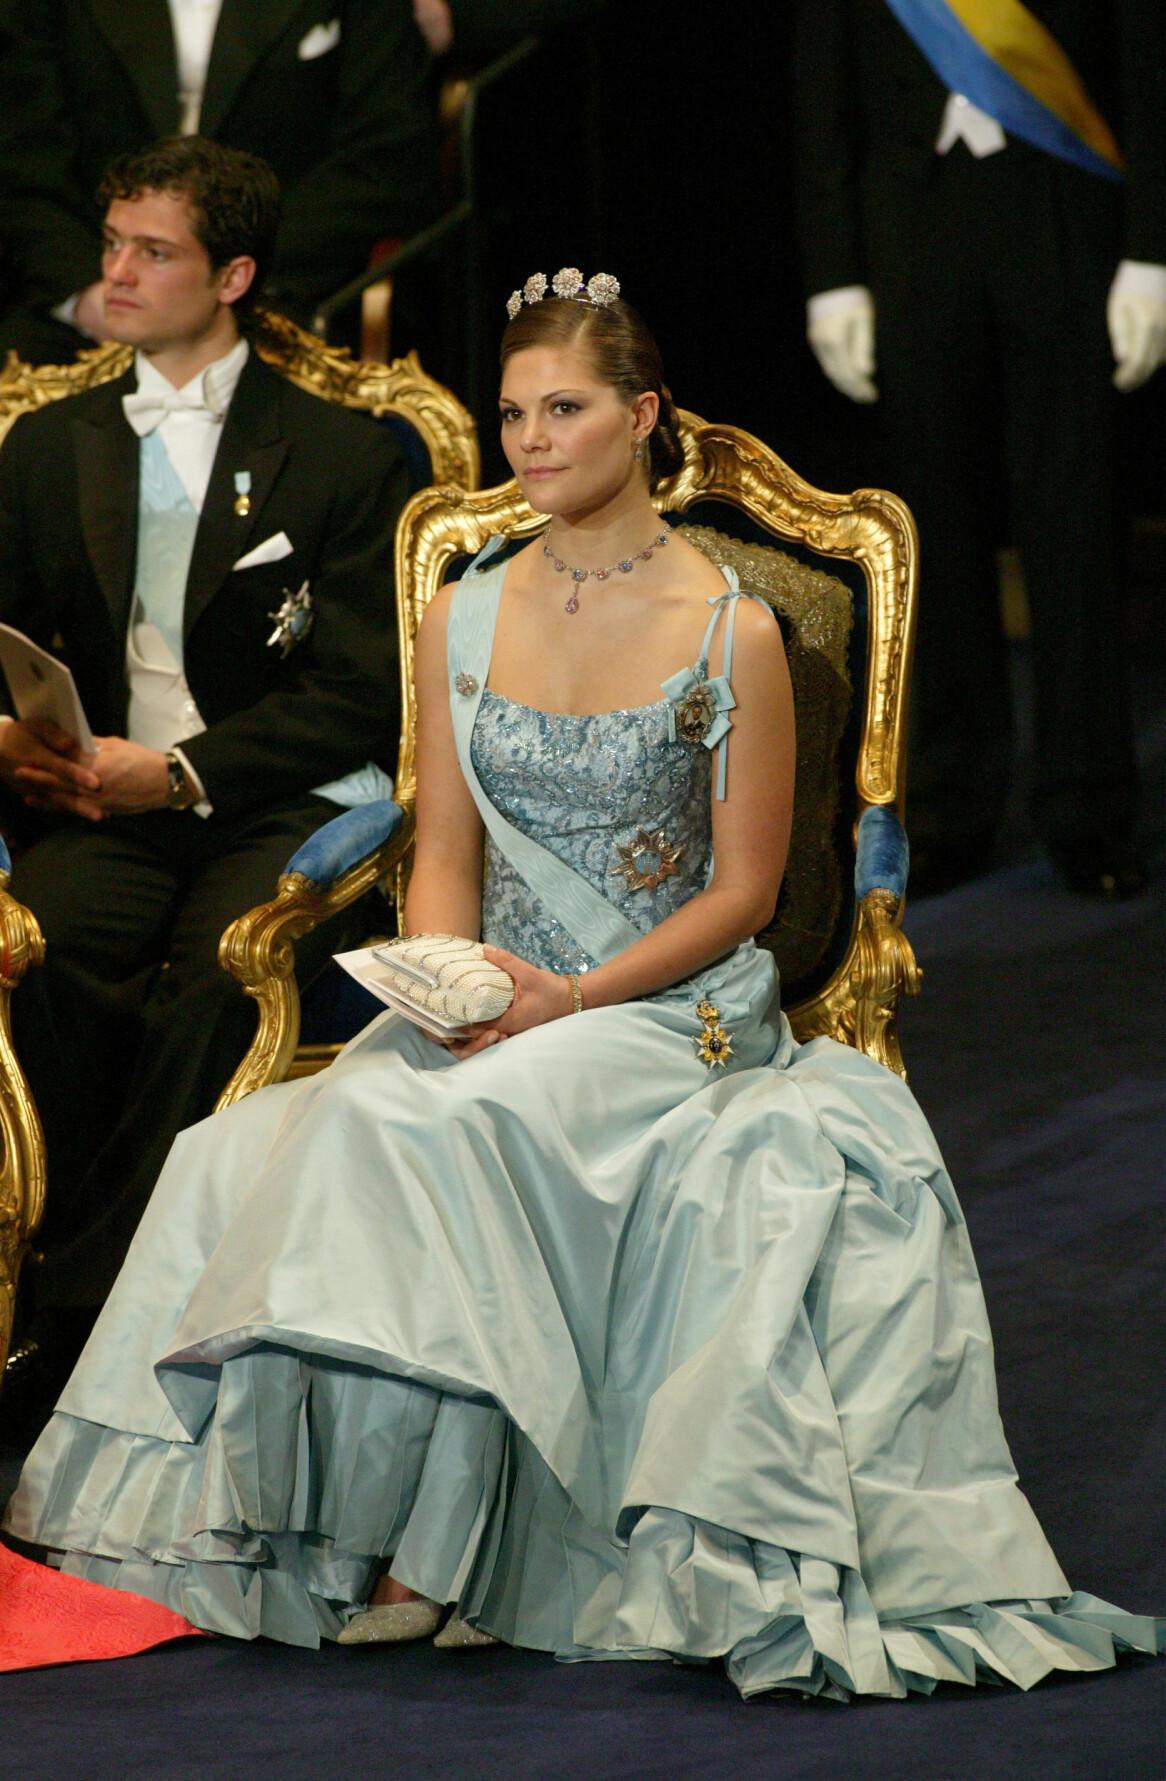 Kronprinsessan Victoria under Nobelprisets utdelning i Stockholm 2003.